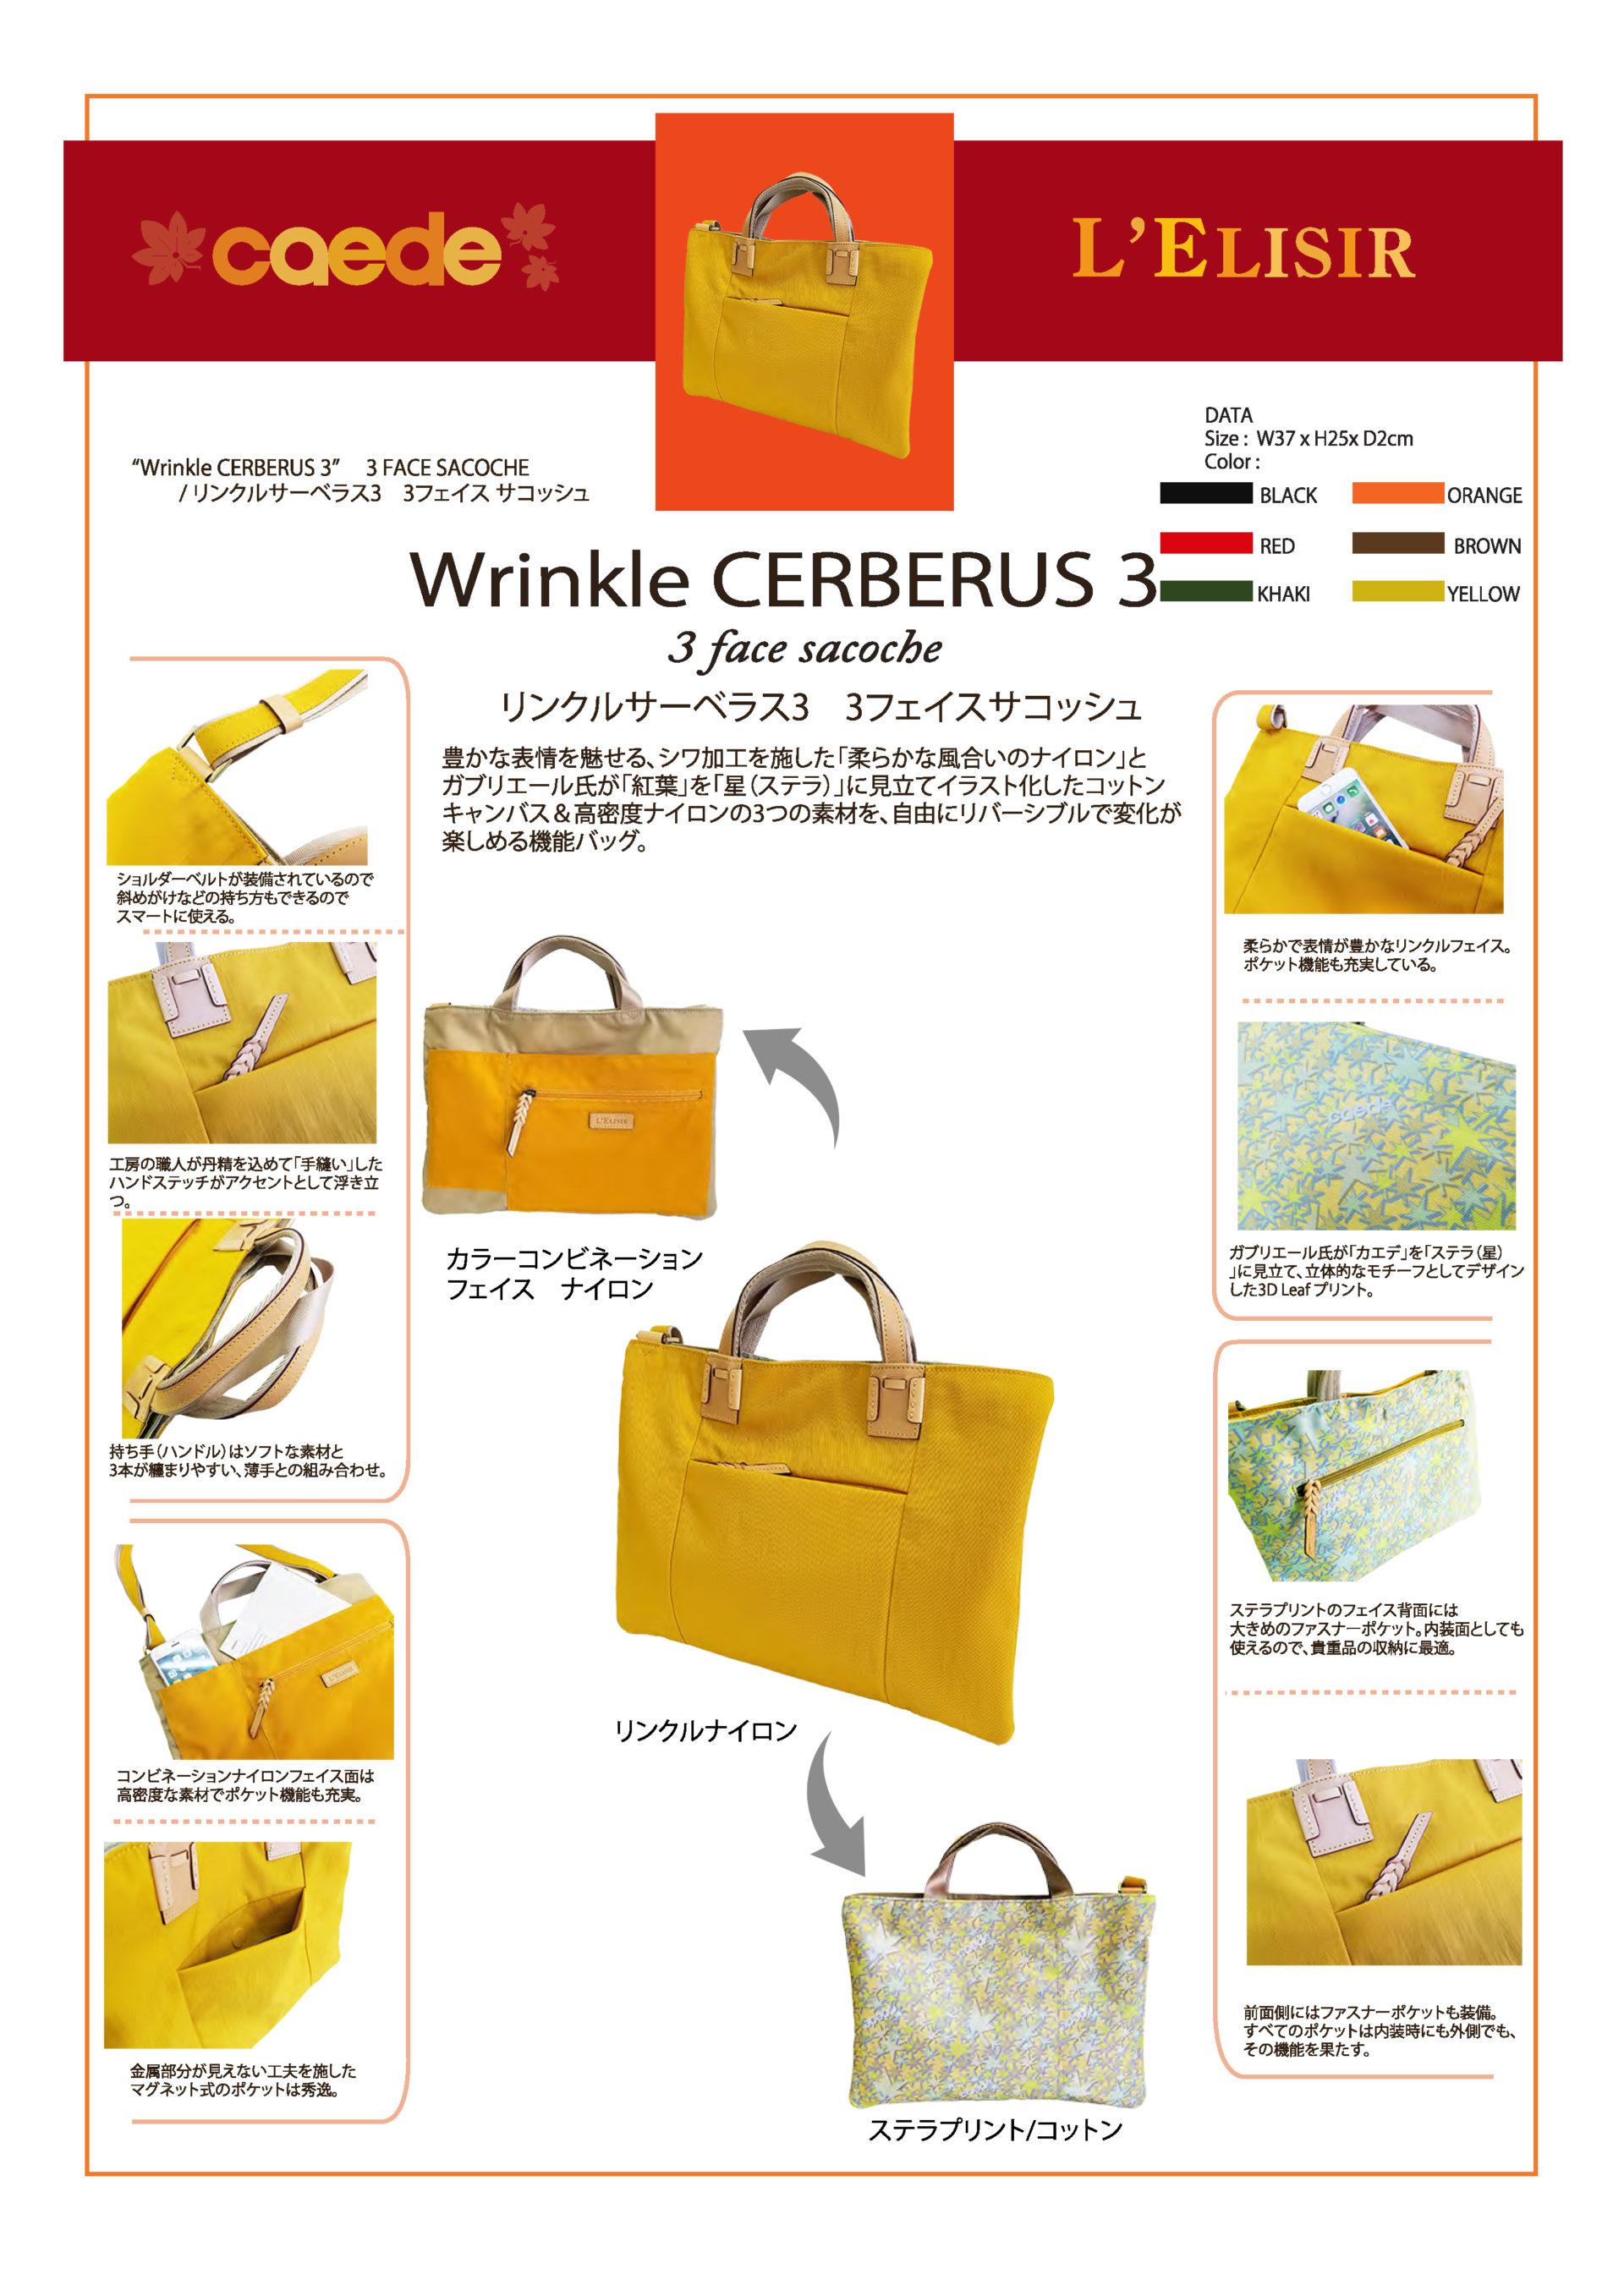 72922-Wrinkle CERBERUS 3 3face sacoche